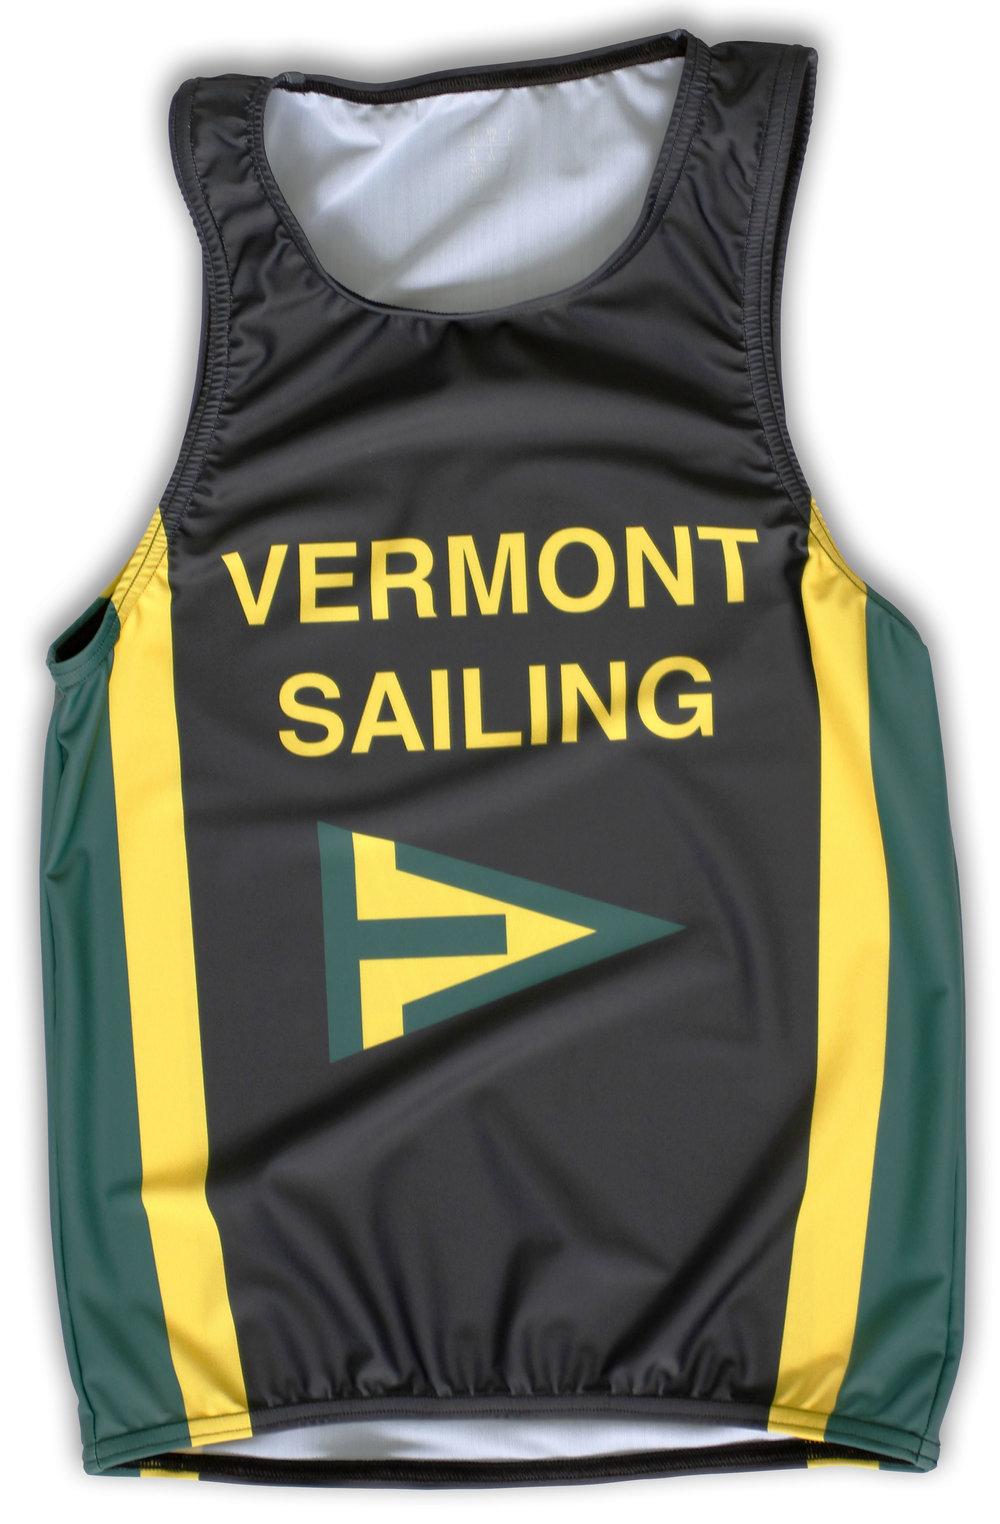 Vermont_Sailing_web.jpg